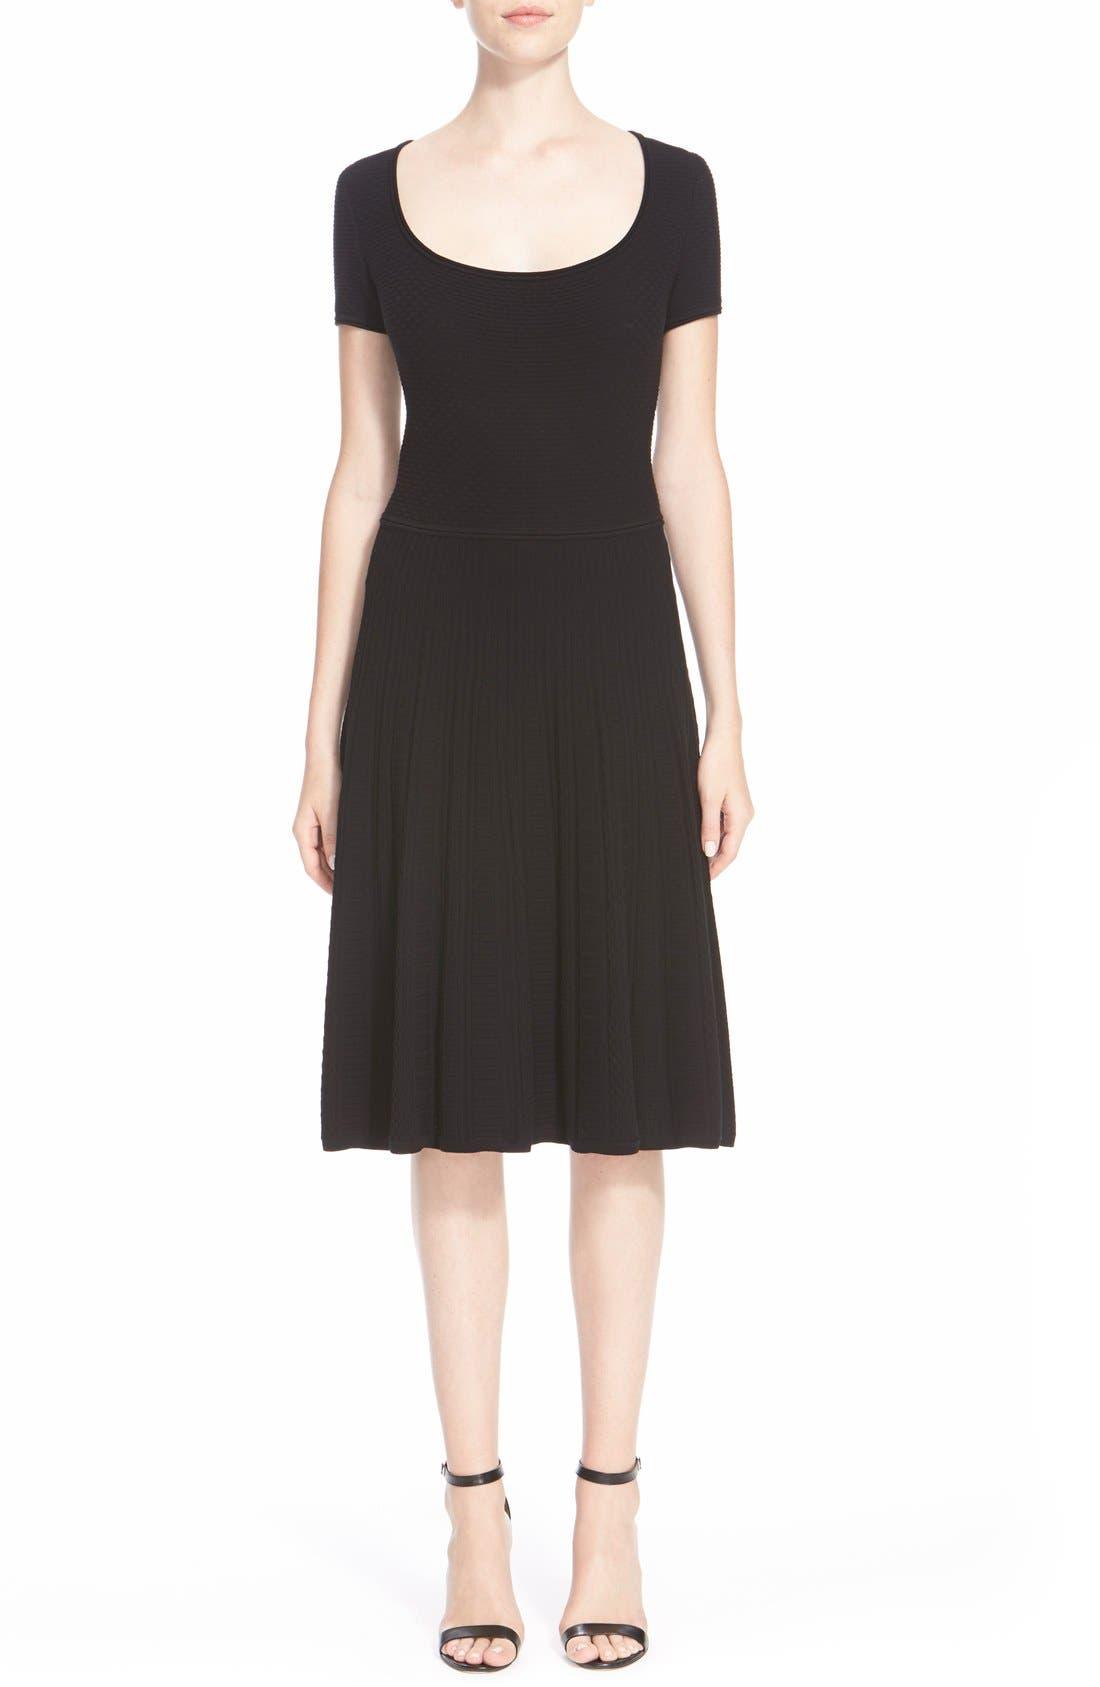 Alternate Image 1 Selected - St. John Collection 'Colette'Flared Knit Dress